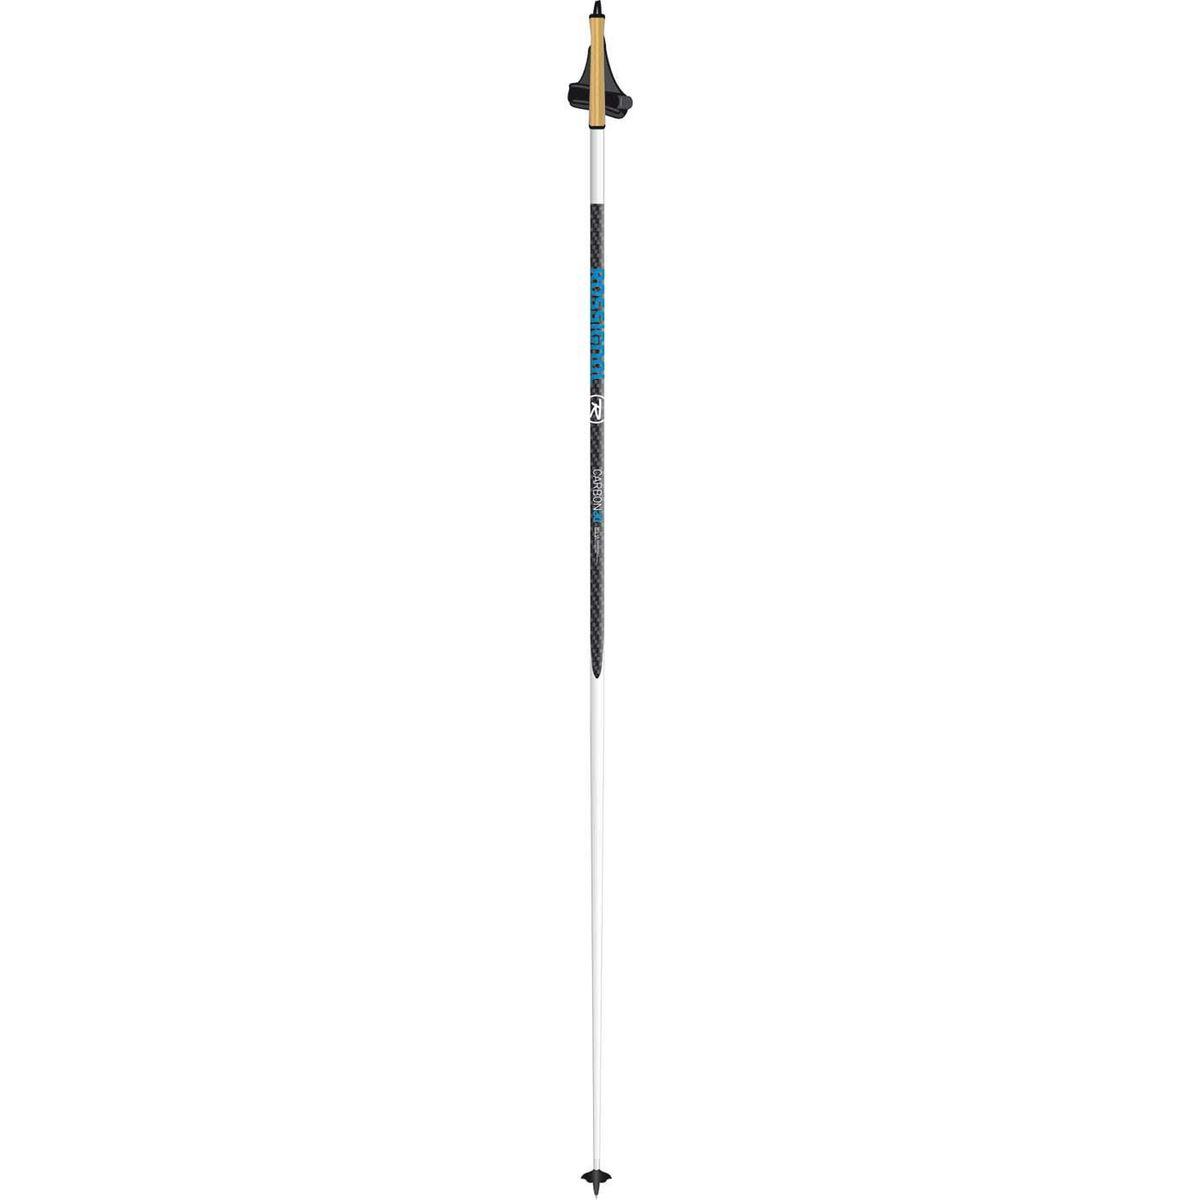 Rossignol Extra Carbon 30 Ski Pole